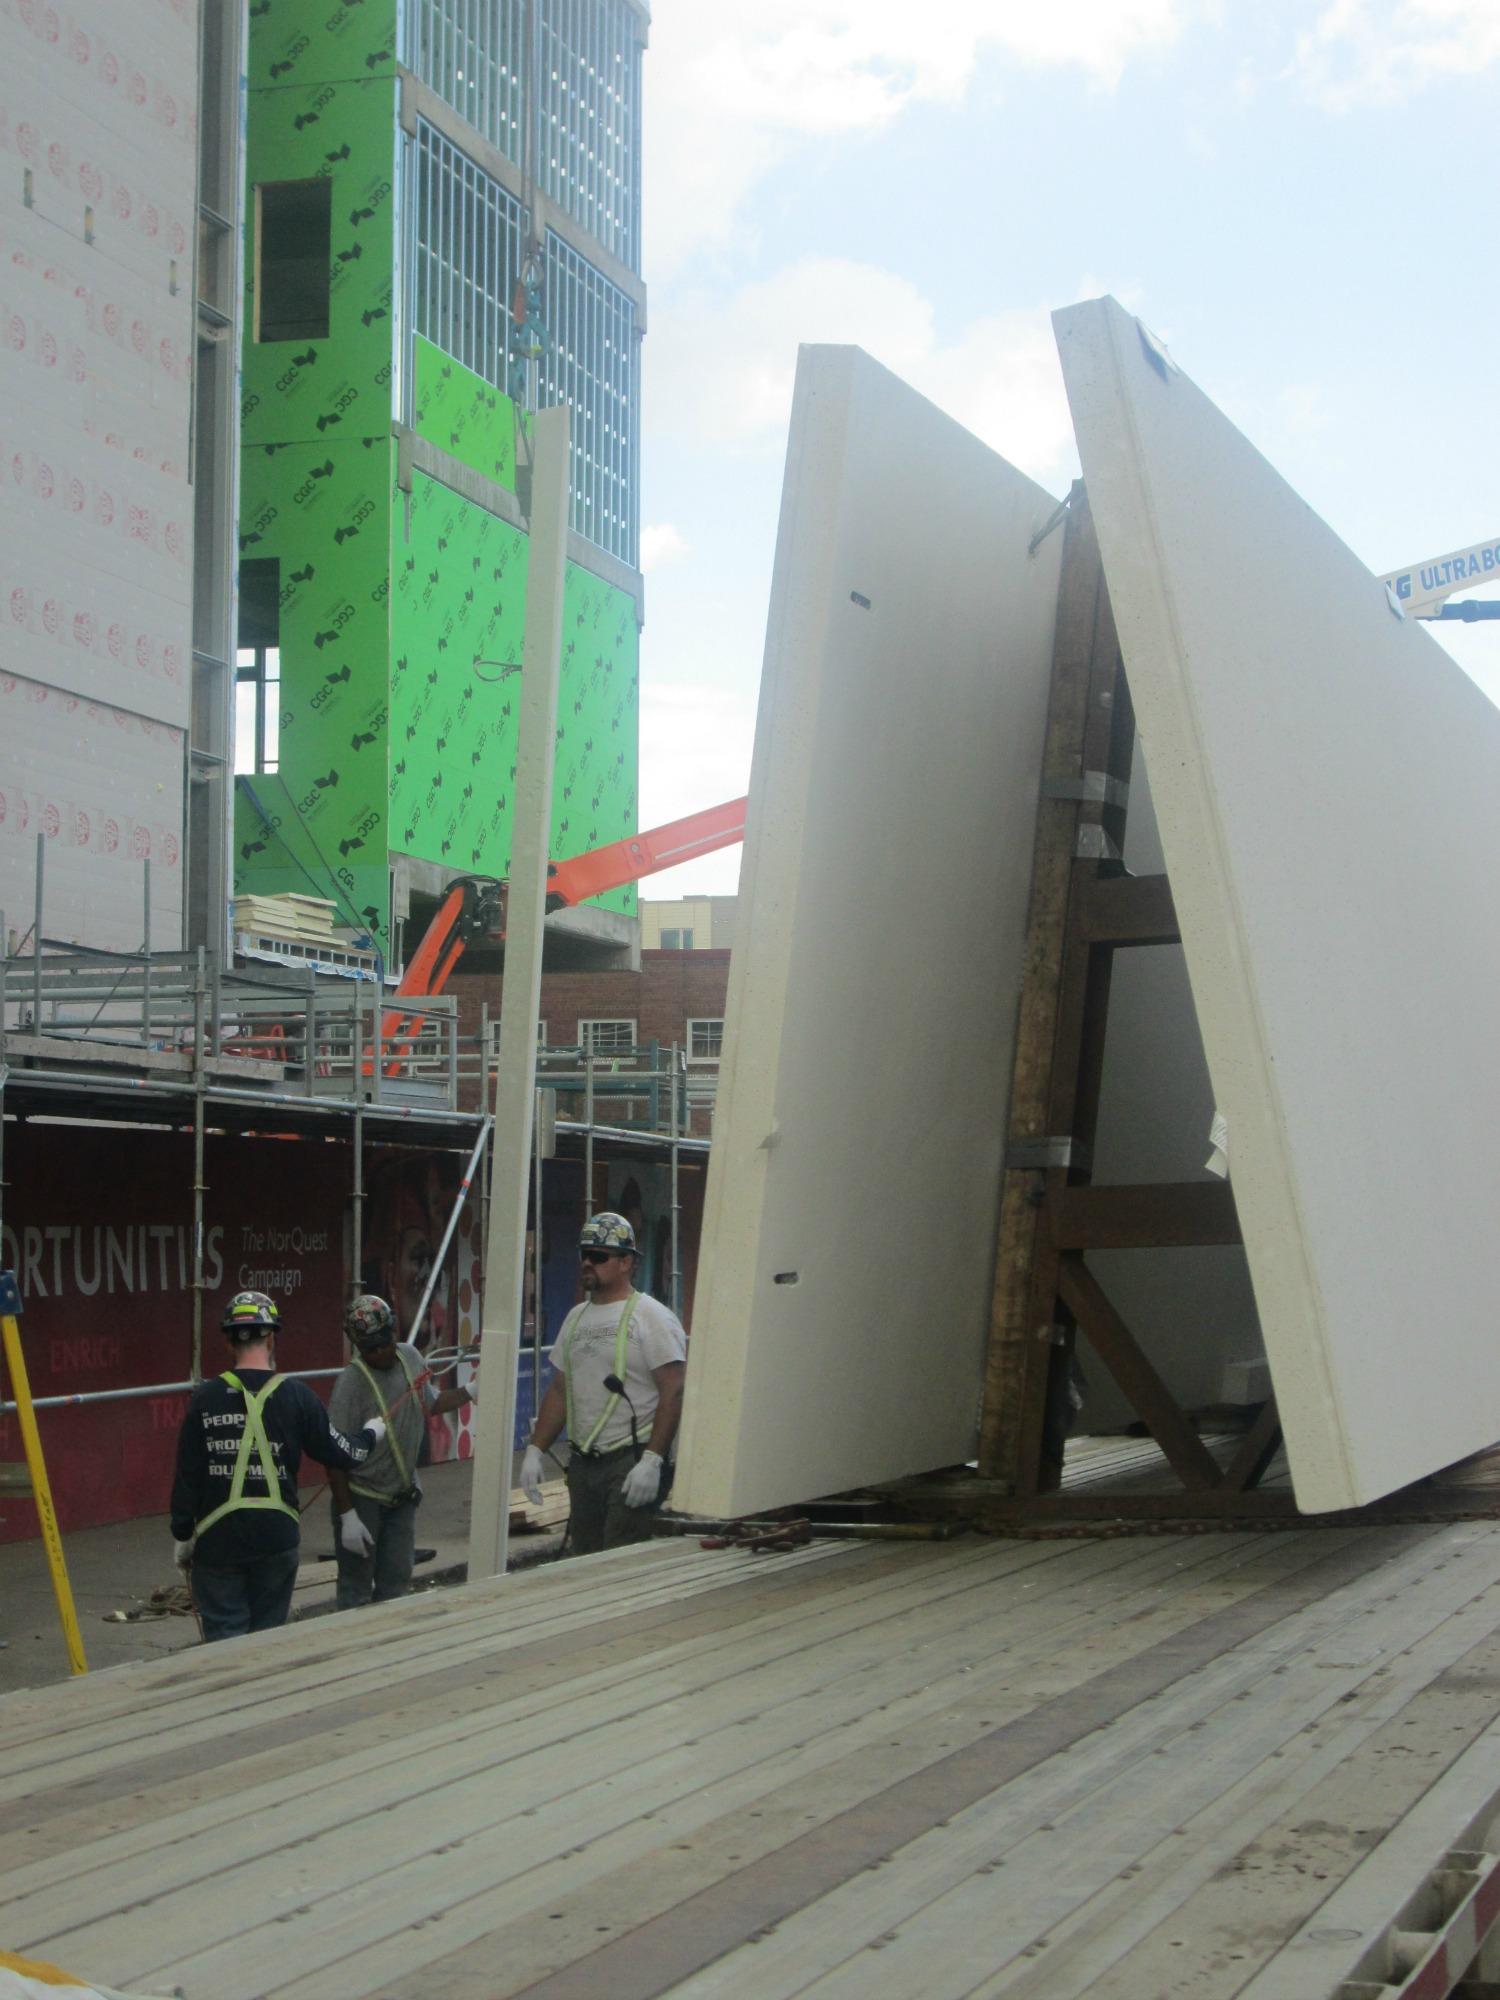 Precast Concrete Cladding Sheets : Precast concrete wall cladding panels norquest college by